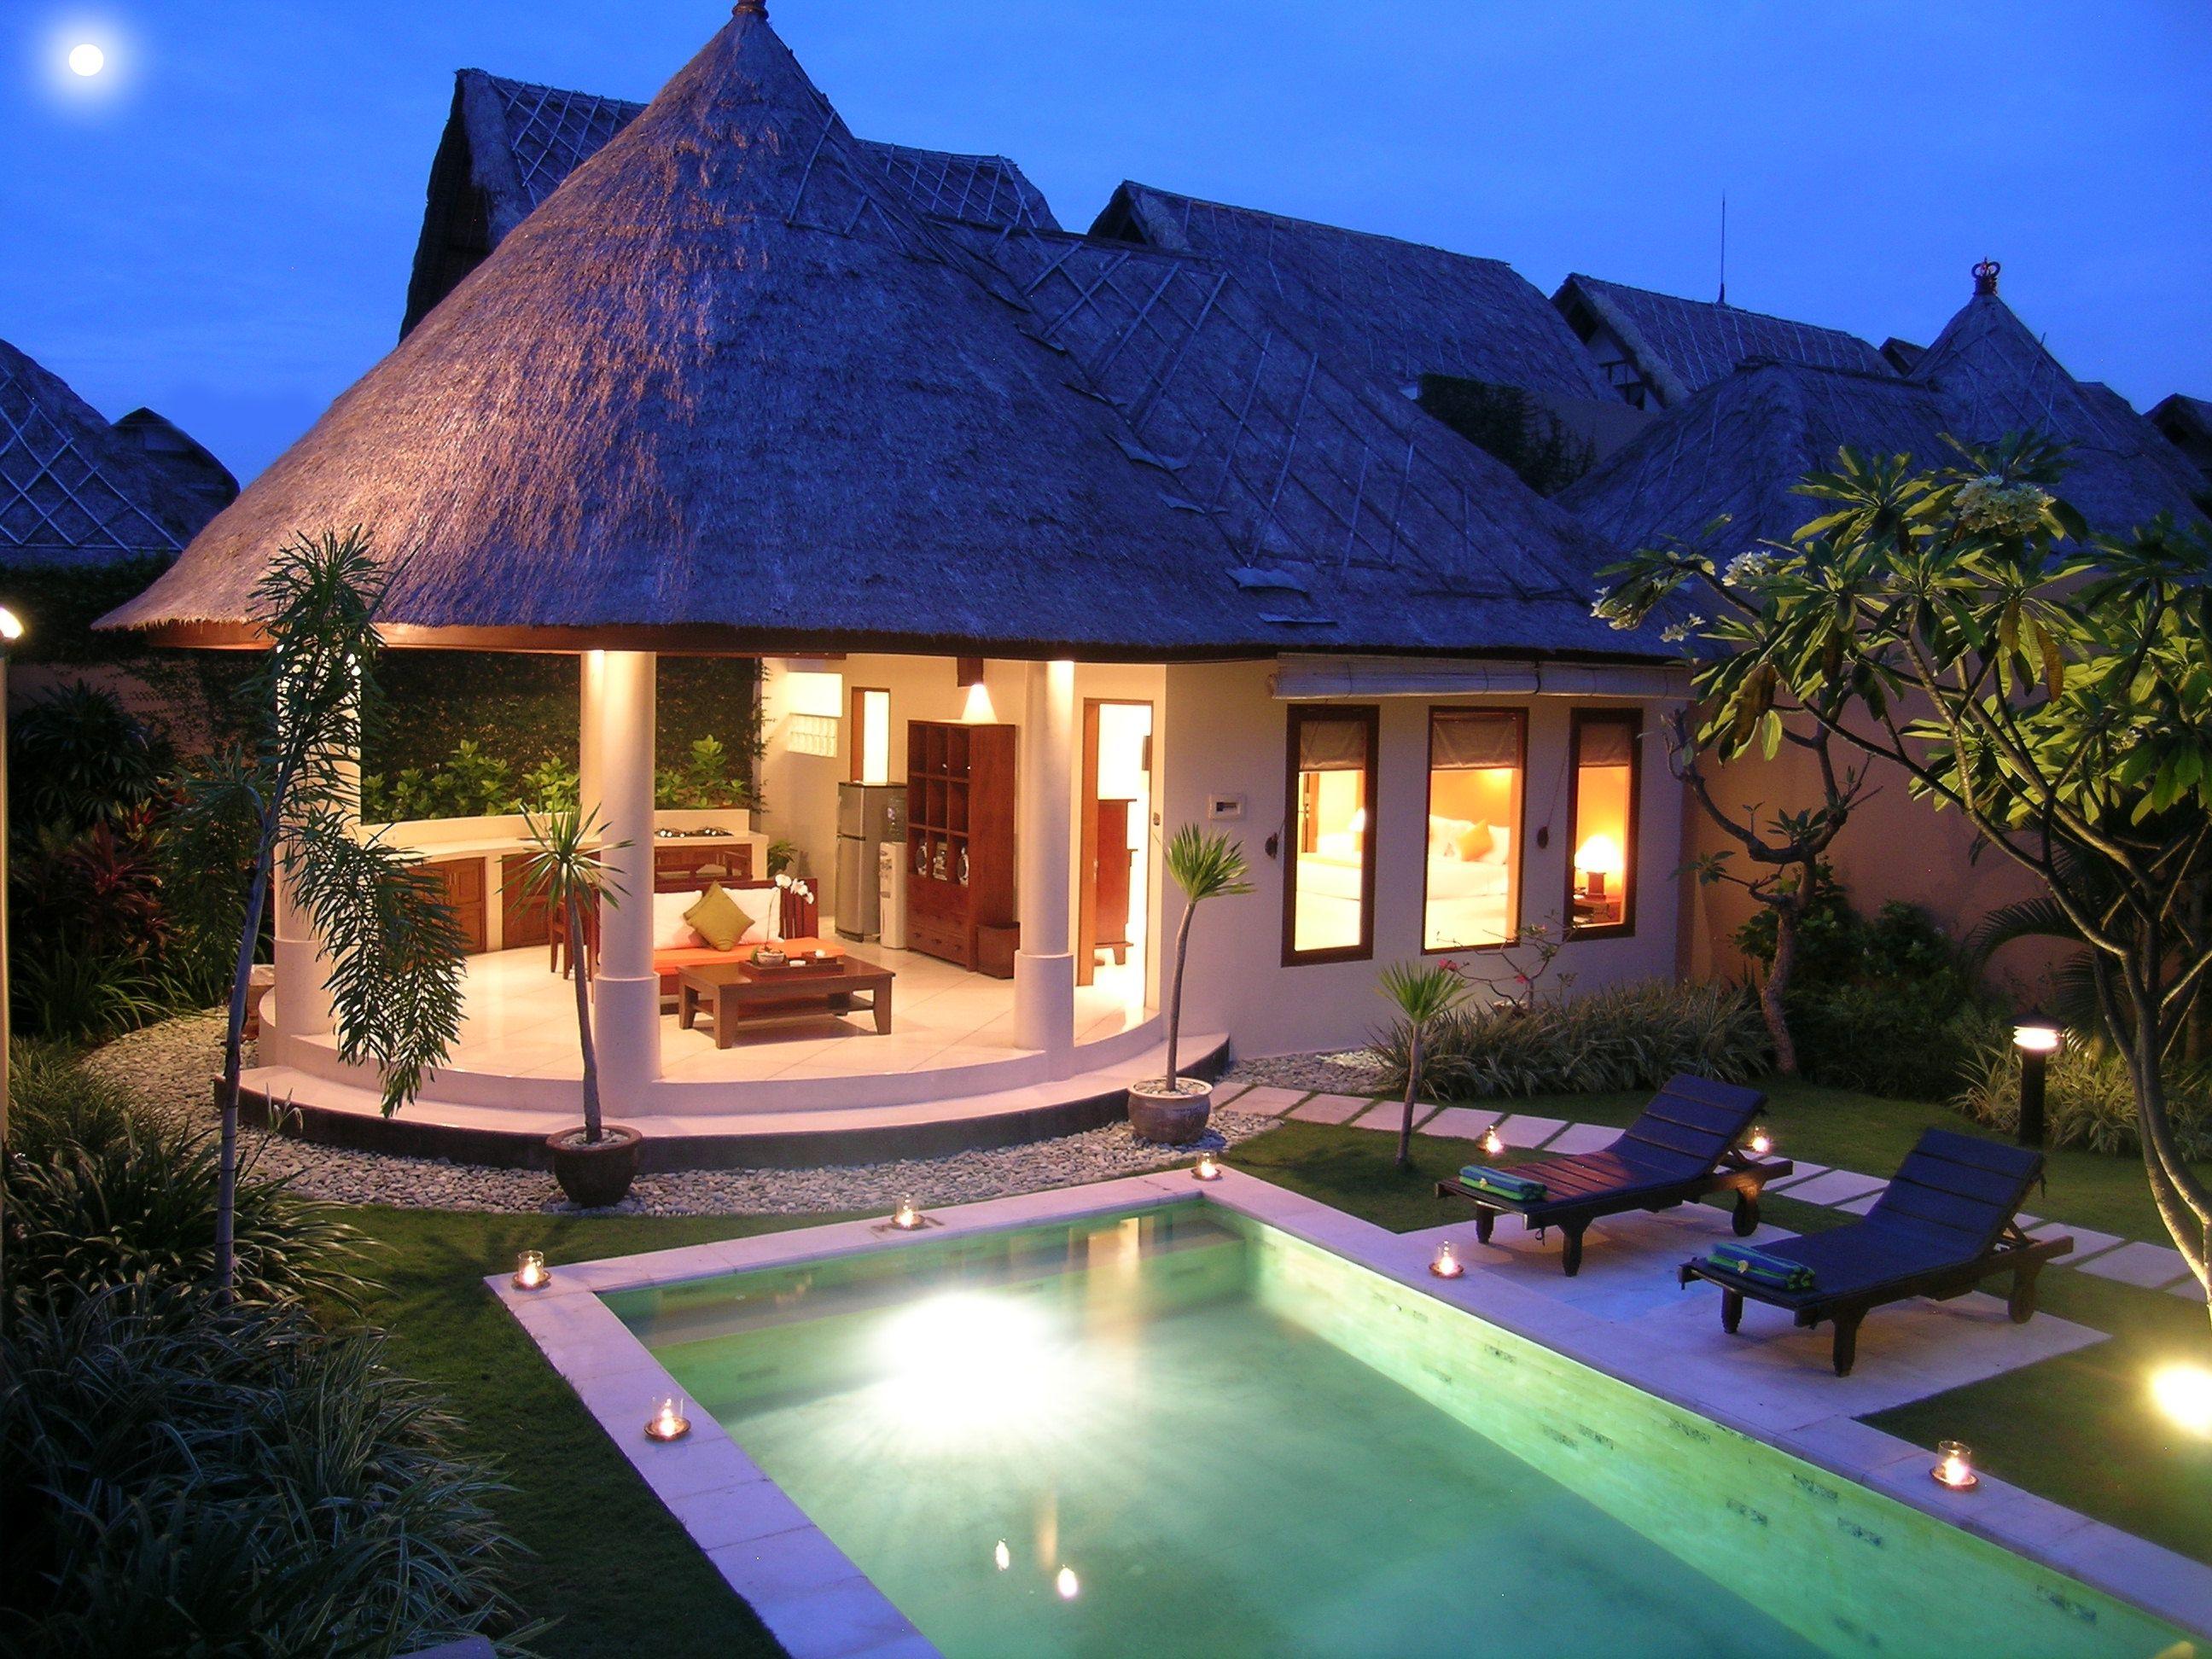 Bali Resorts Images Bali Boutique Resort Villas And